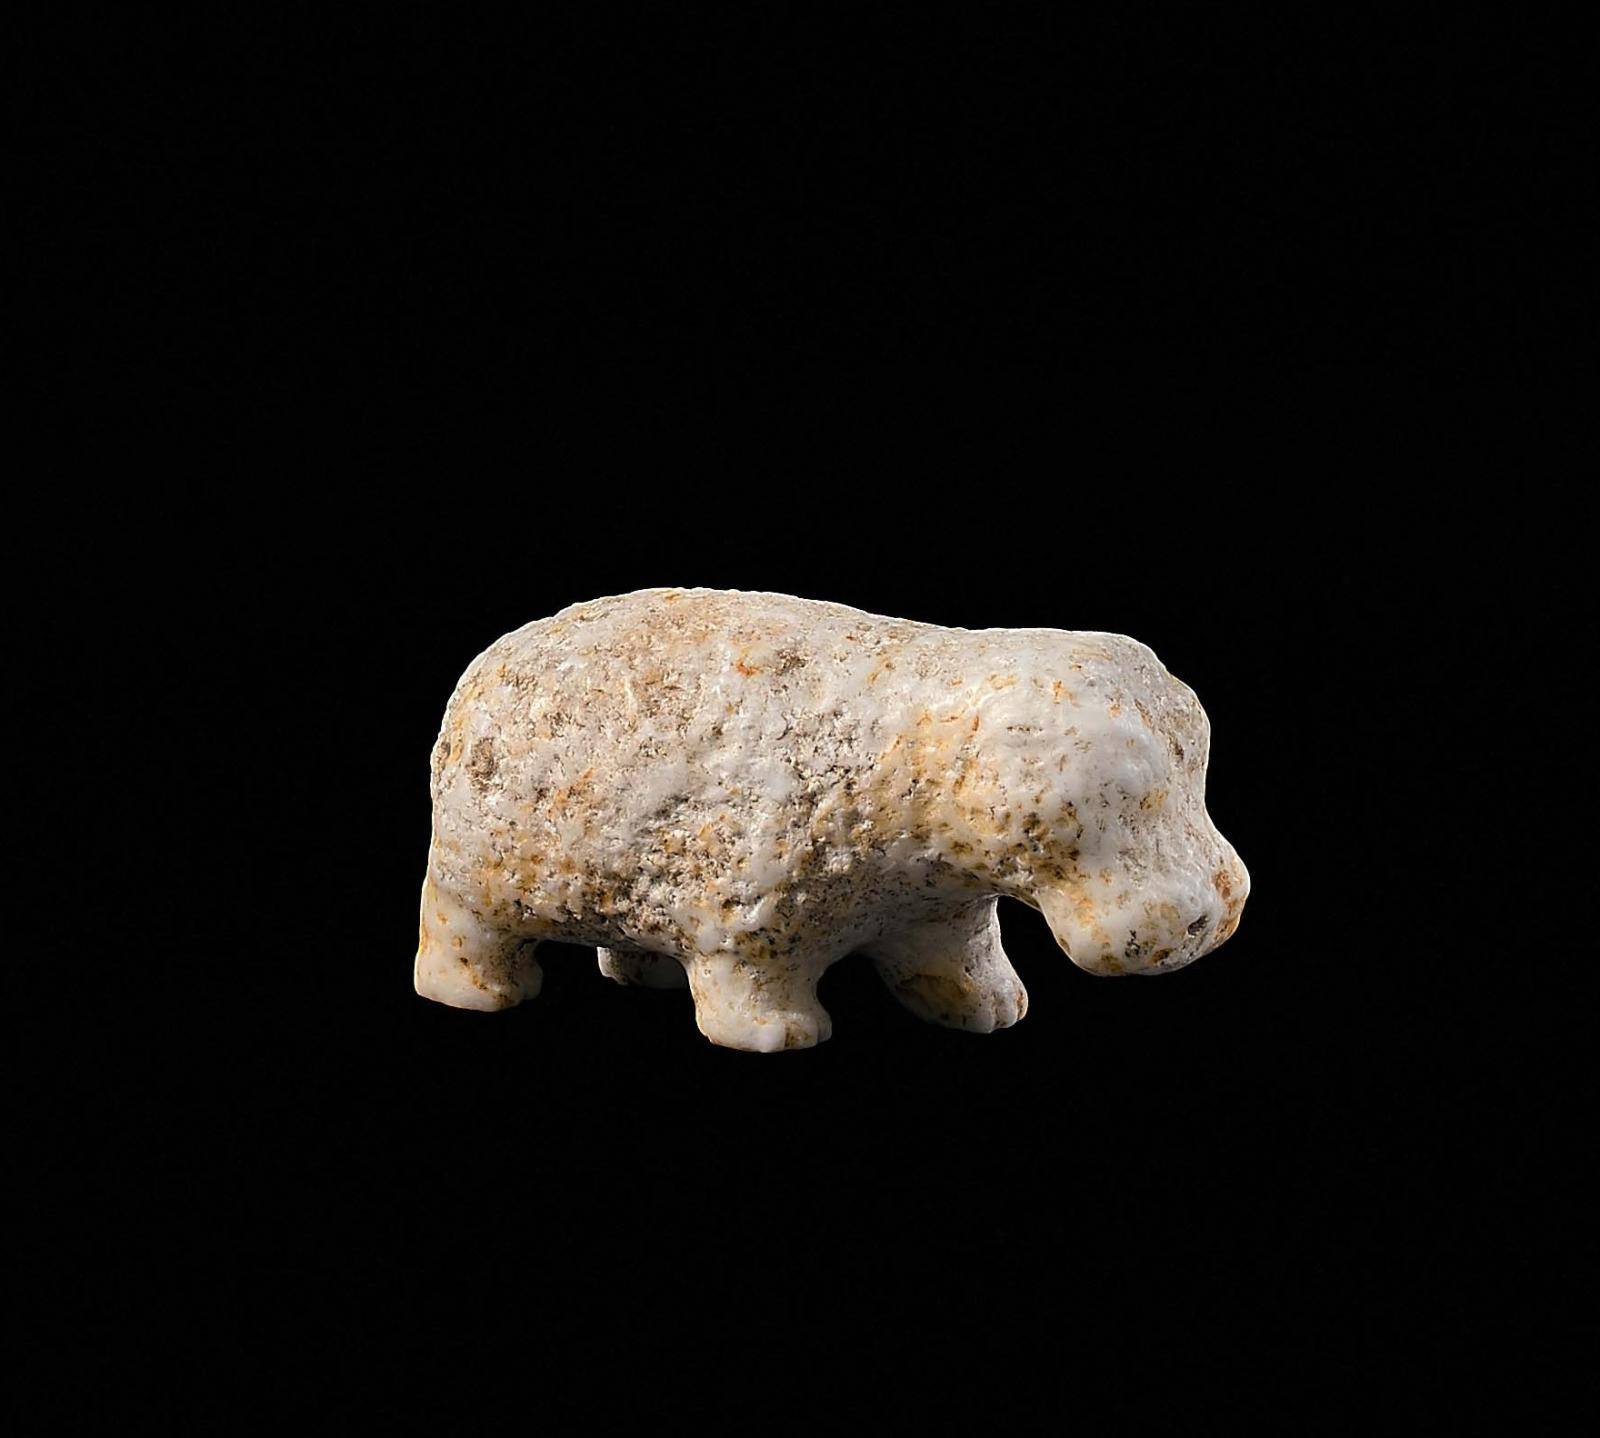 Égypte, Moyen Empire, 2050-1780av.J.-C. Hippopotame en pierre calcaire, 2,7x5,8cm. Galerie Eberwein, Paris.